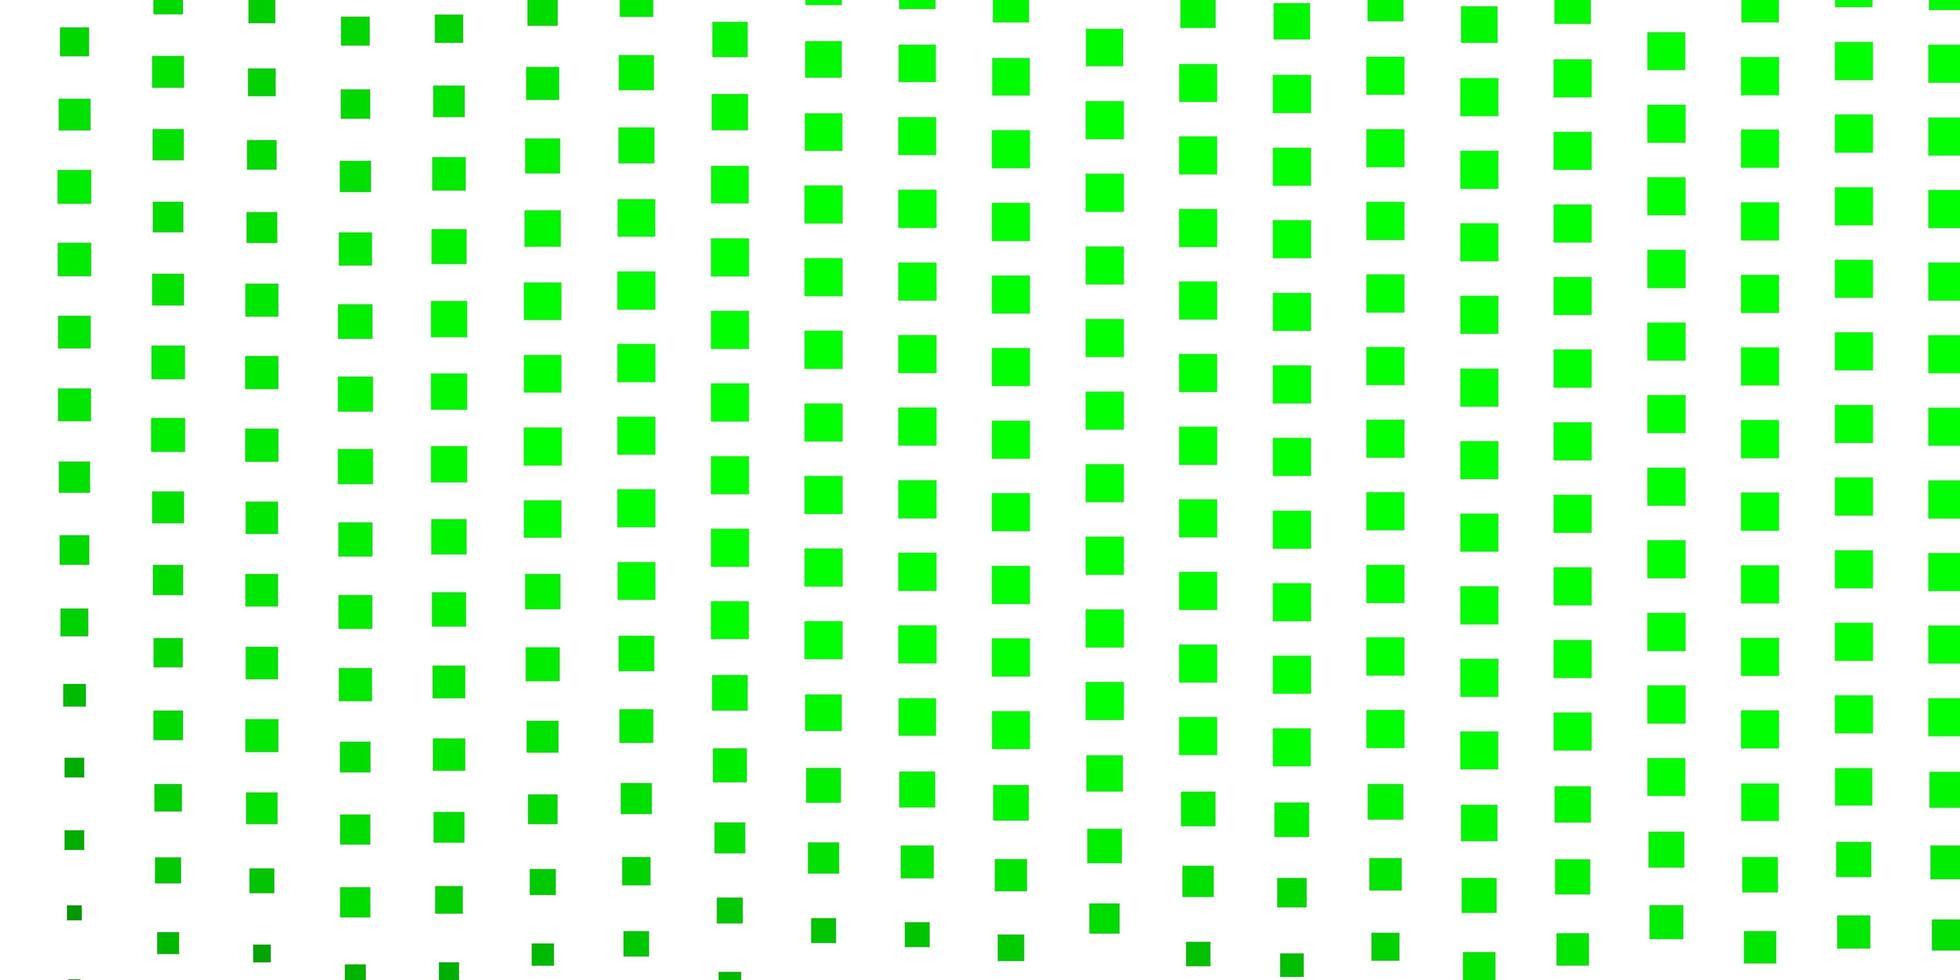 hellgrüne Vektorbeschaffenheit im rechteckigen Stil. vektor